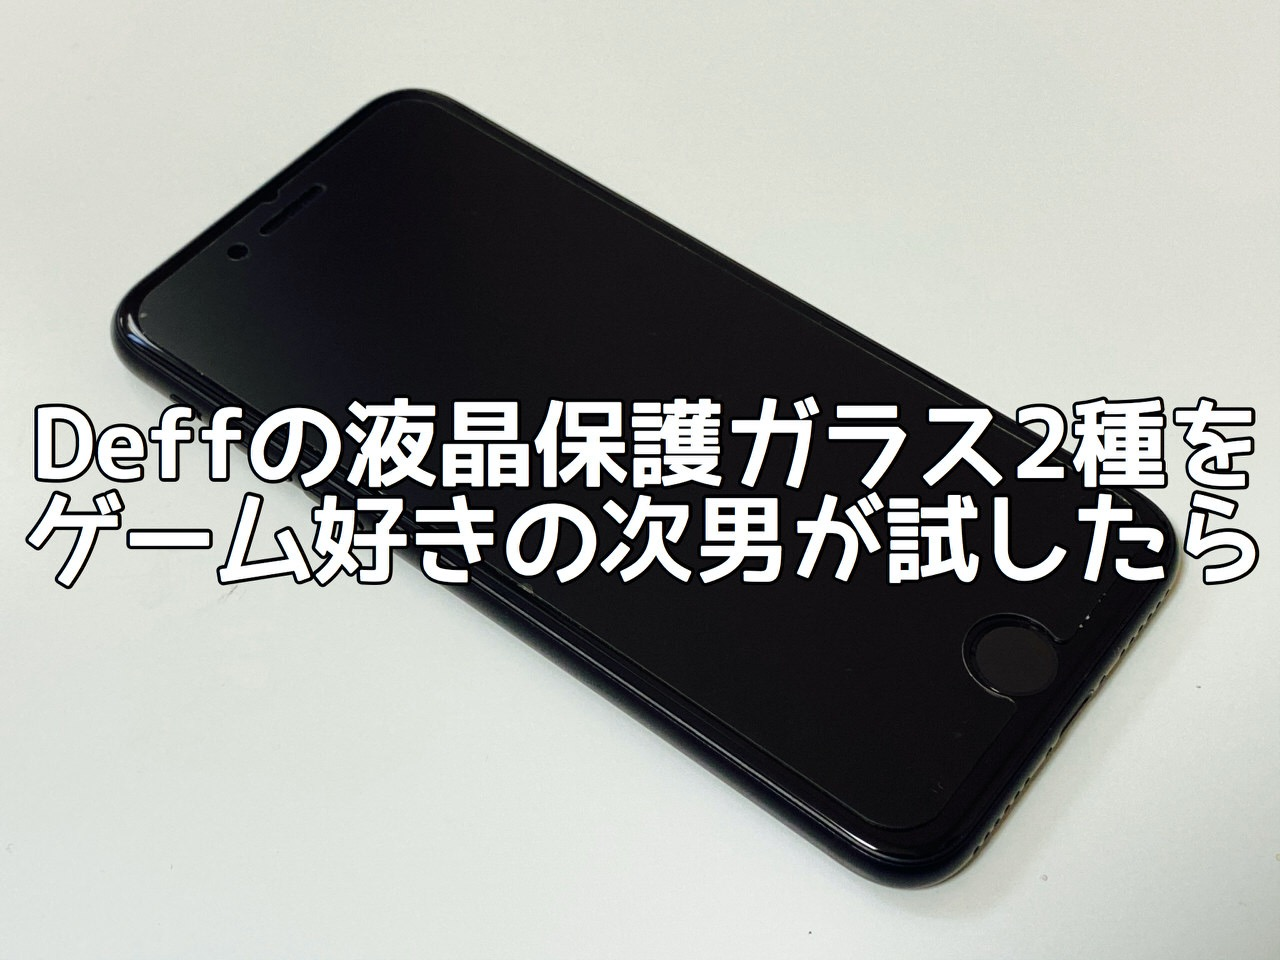 【iPhone SE】「Deff」の液晶保護ガラス2種をゲーム大好き中2の次男が試したら #提供